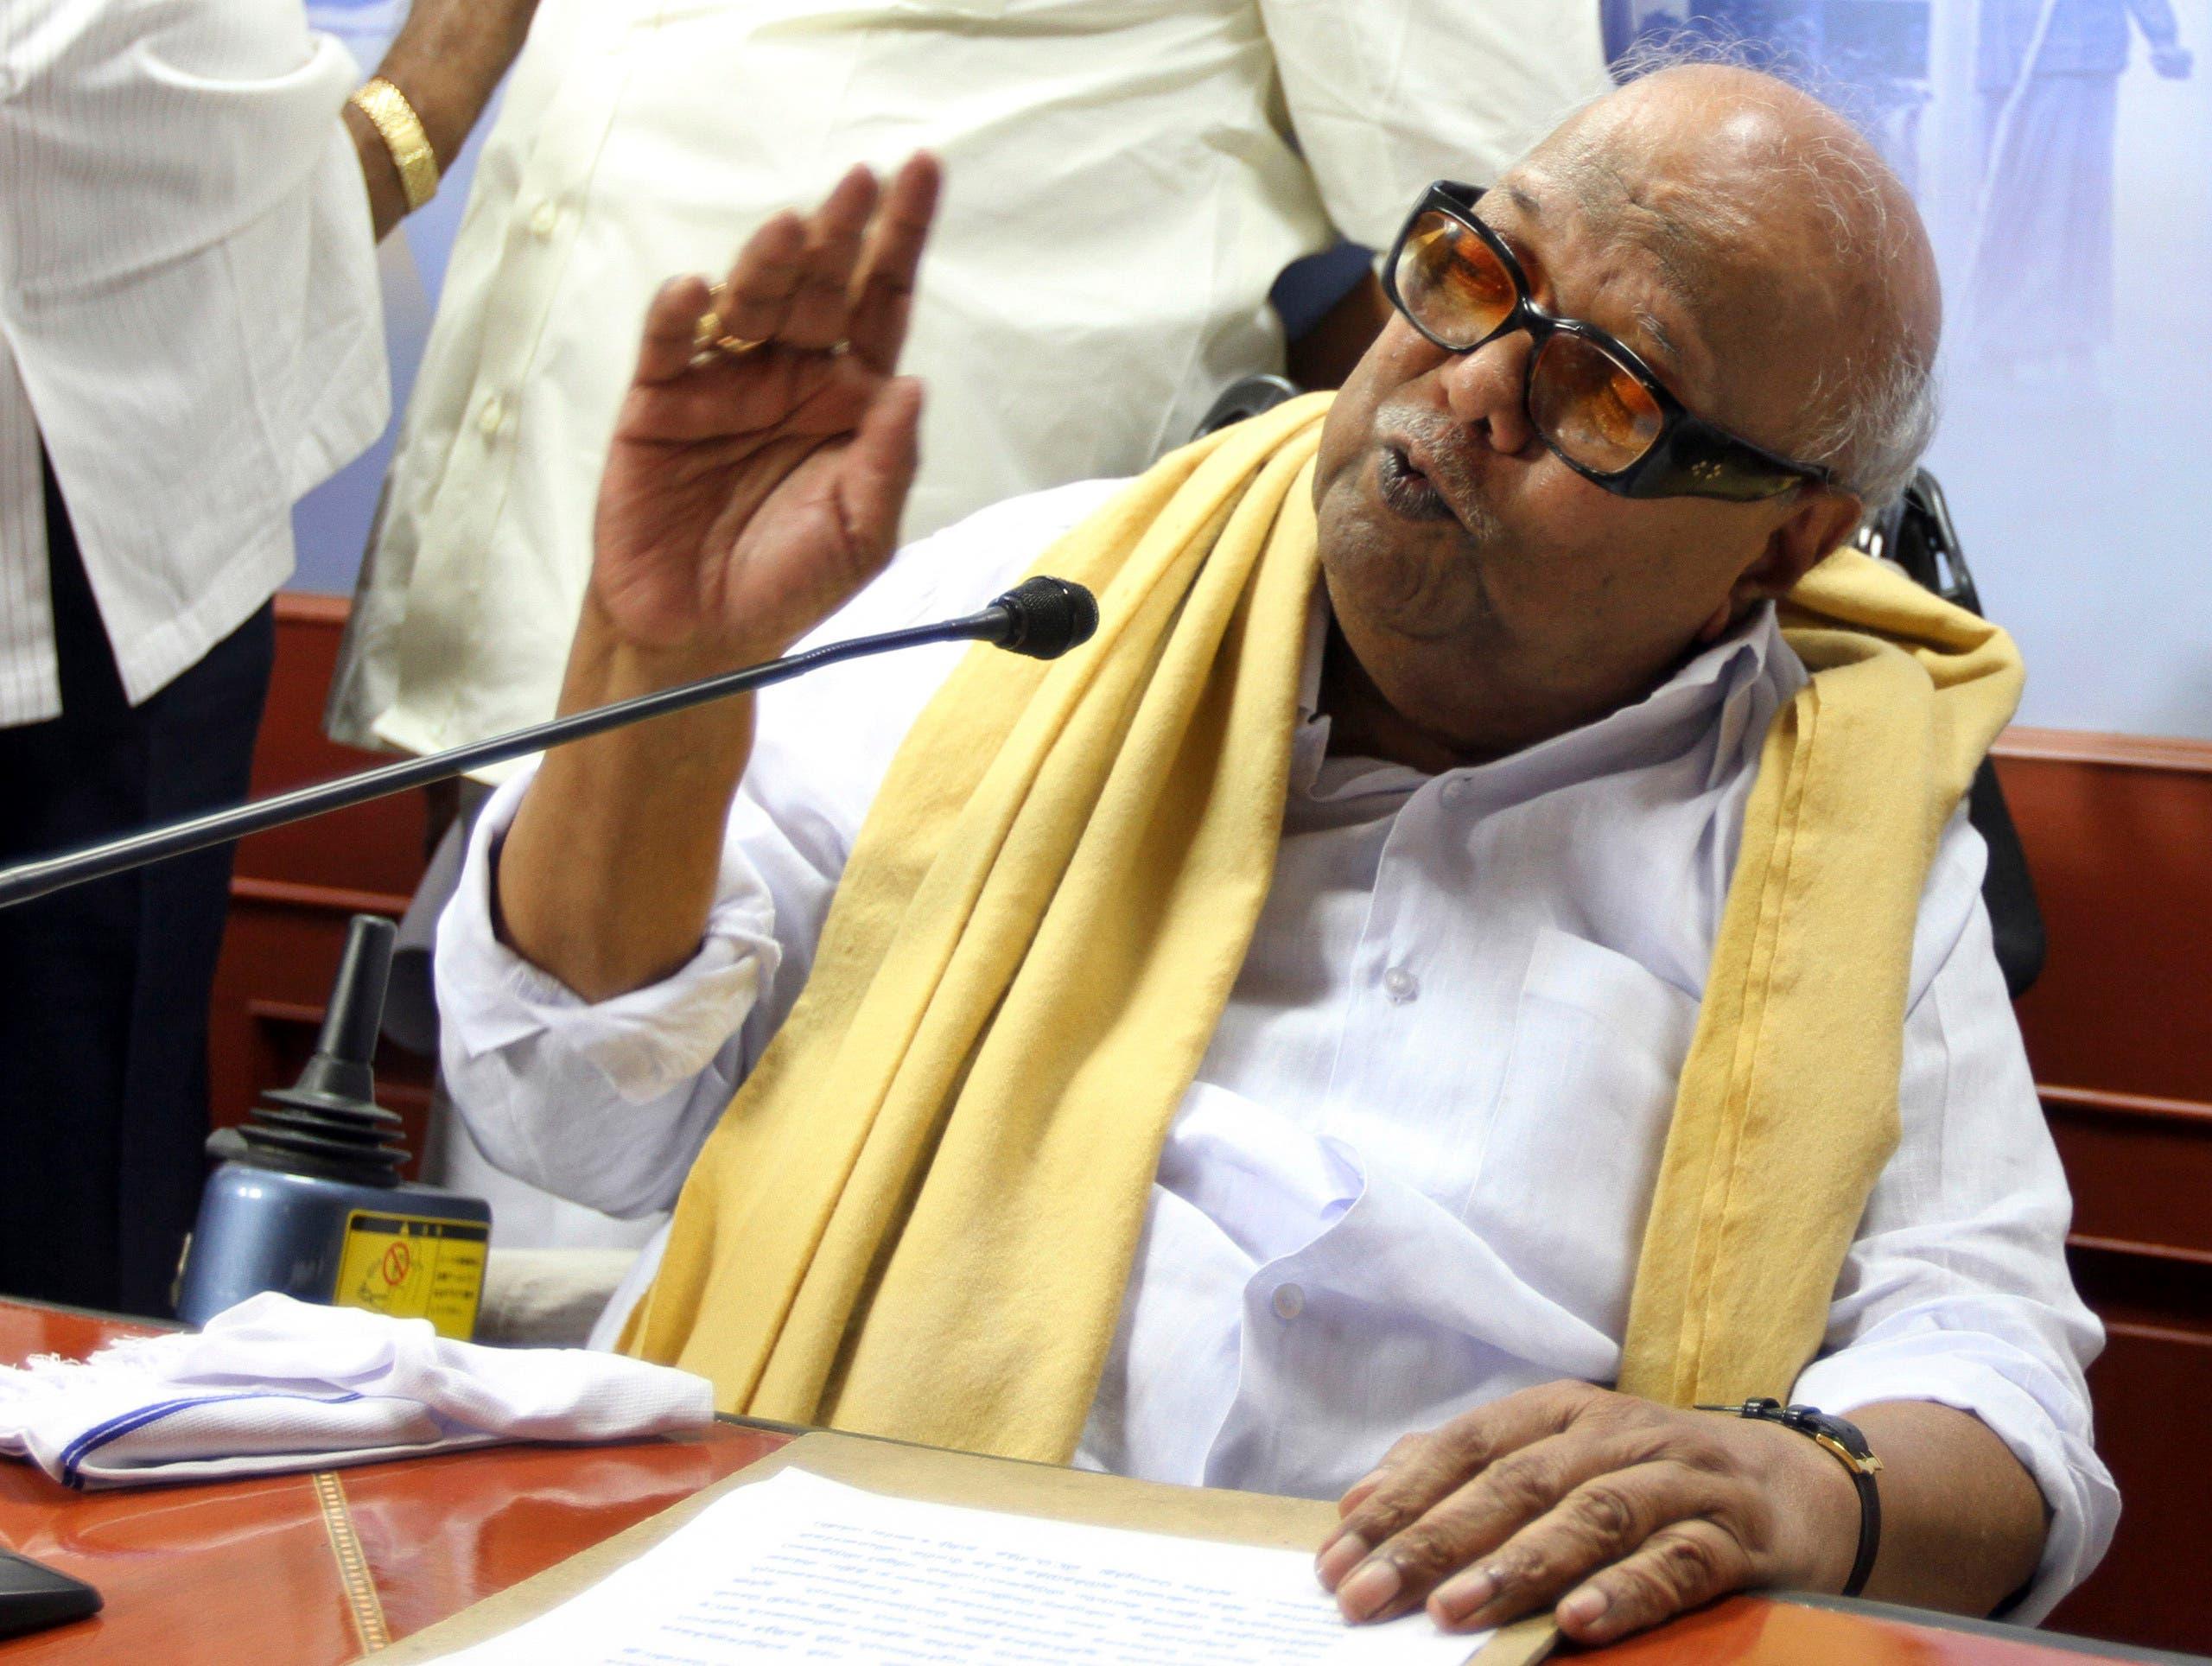 Leader of the Dravida Munnetra Kazhagam party M. Karunanidhi speaks at a press conference. (AP)